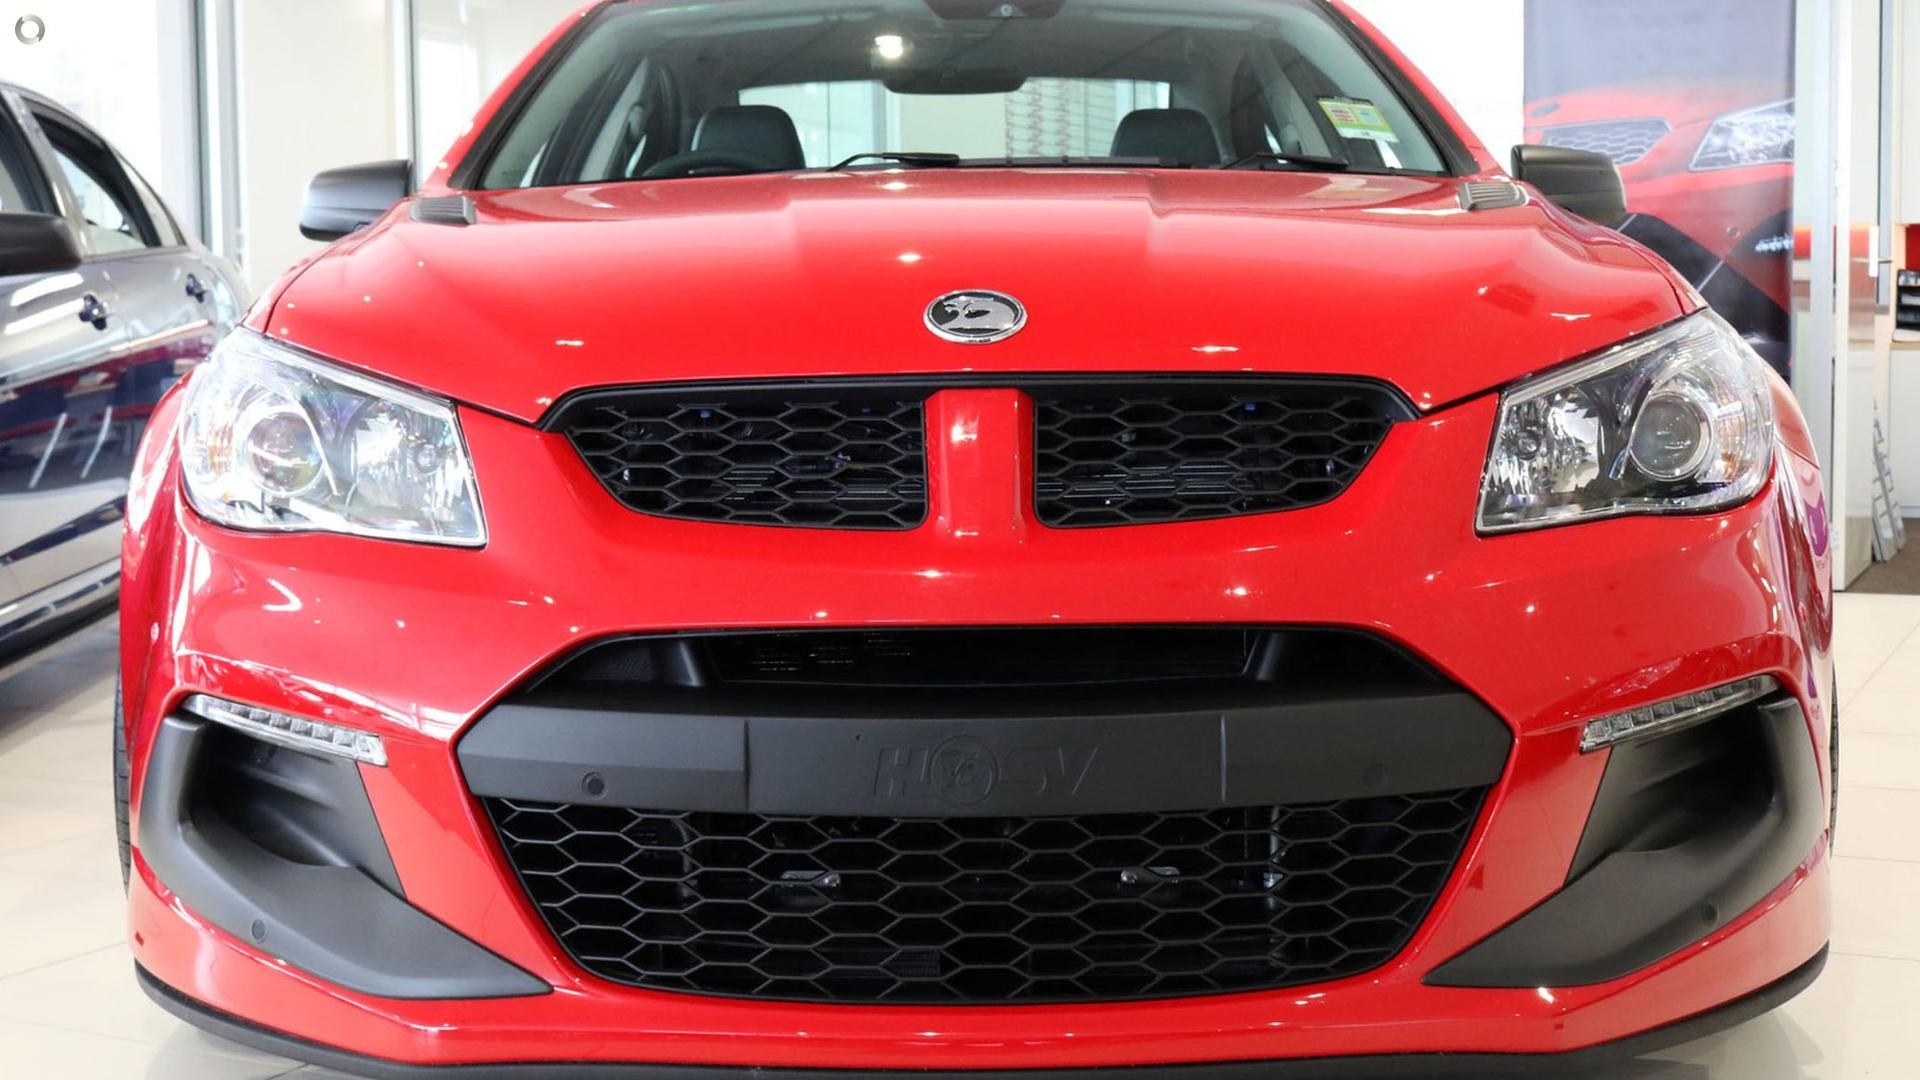 2017 Holden Special Vehicles Clubsport GEN-F2